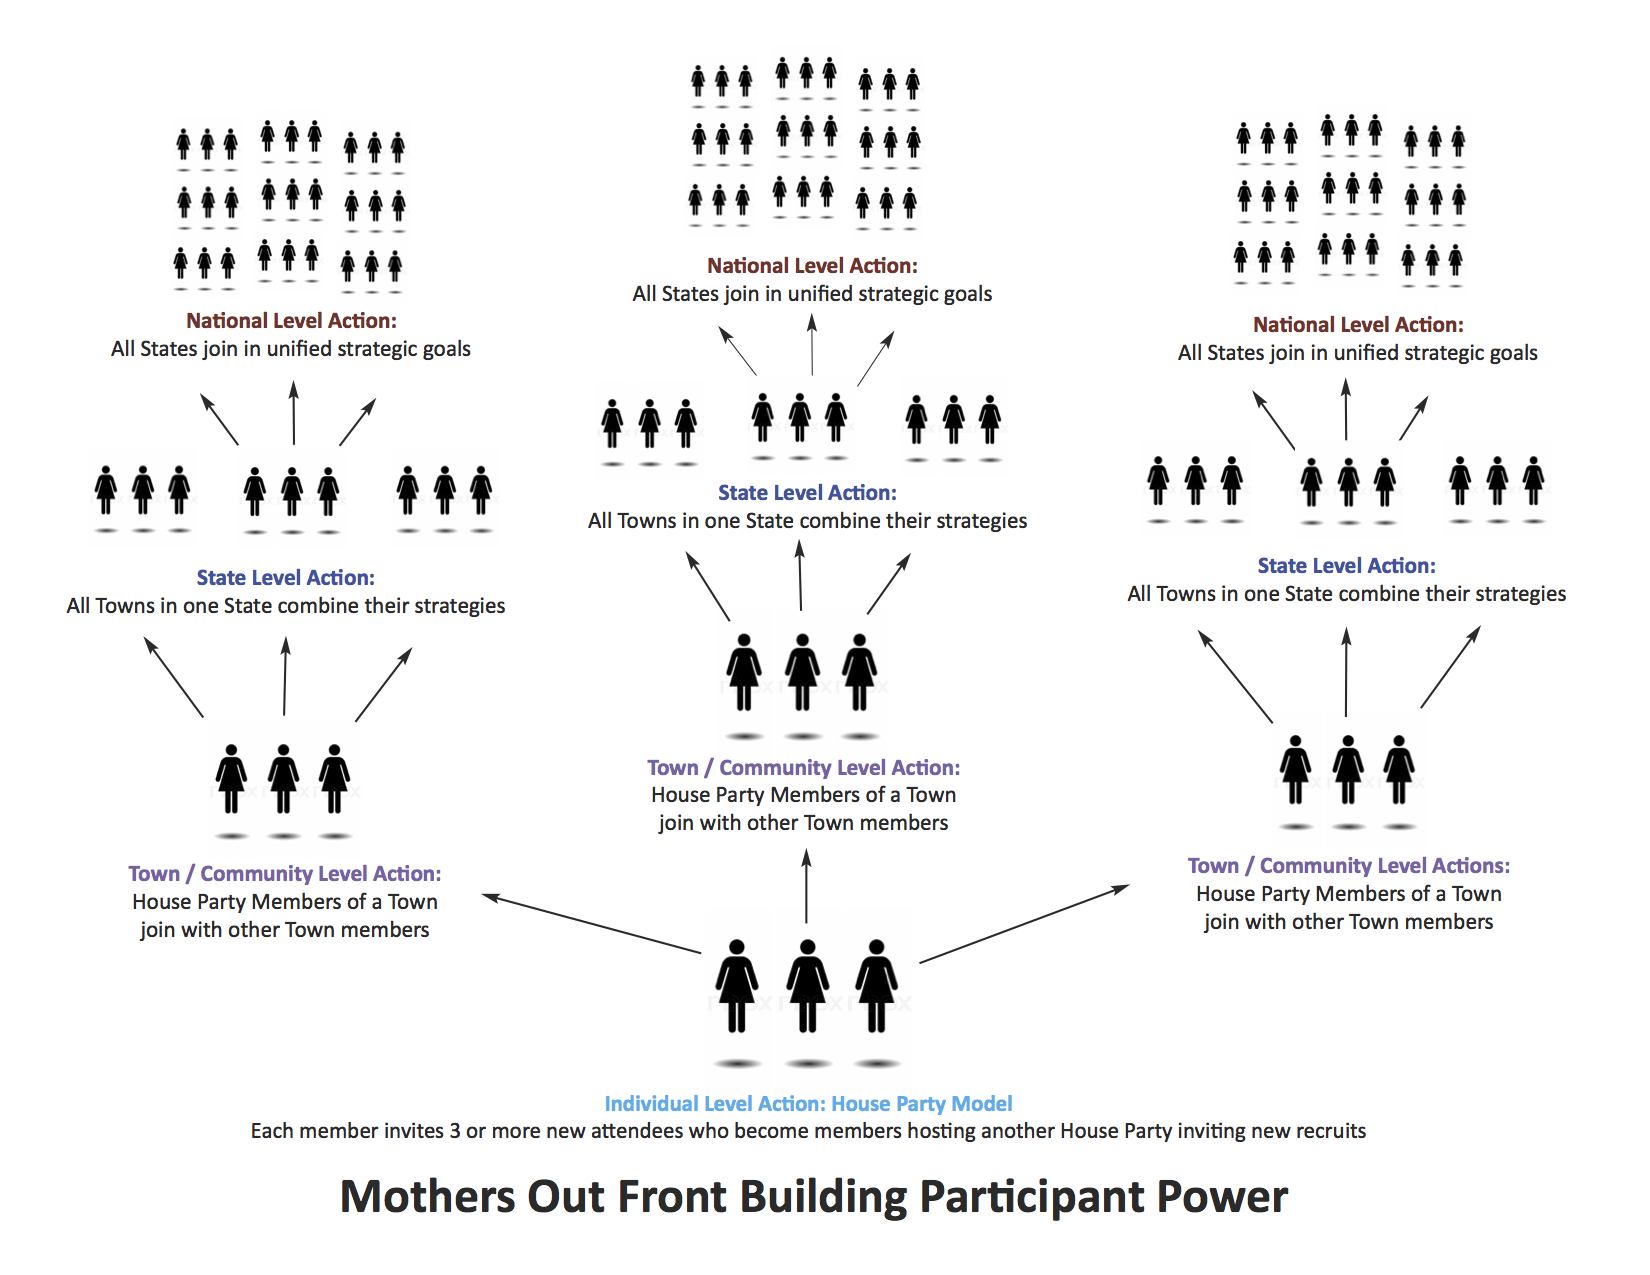 MOF_PowerBuild_Chart.png